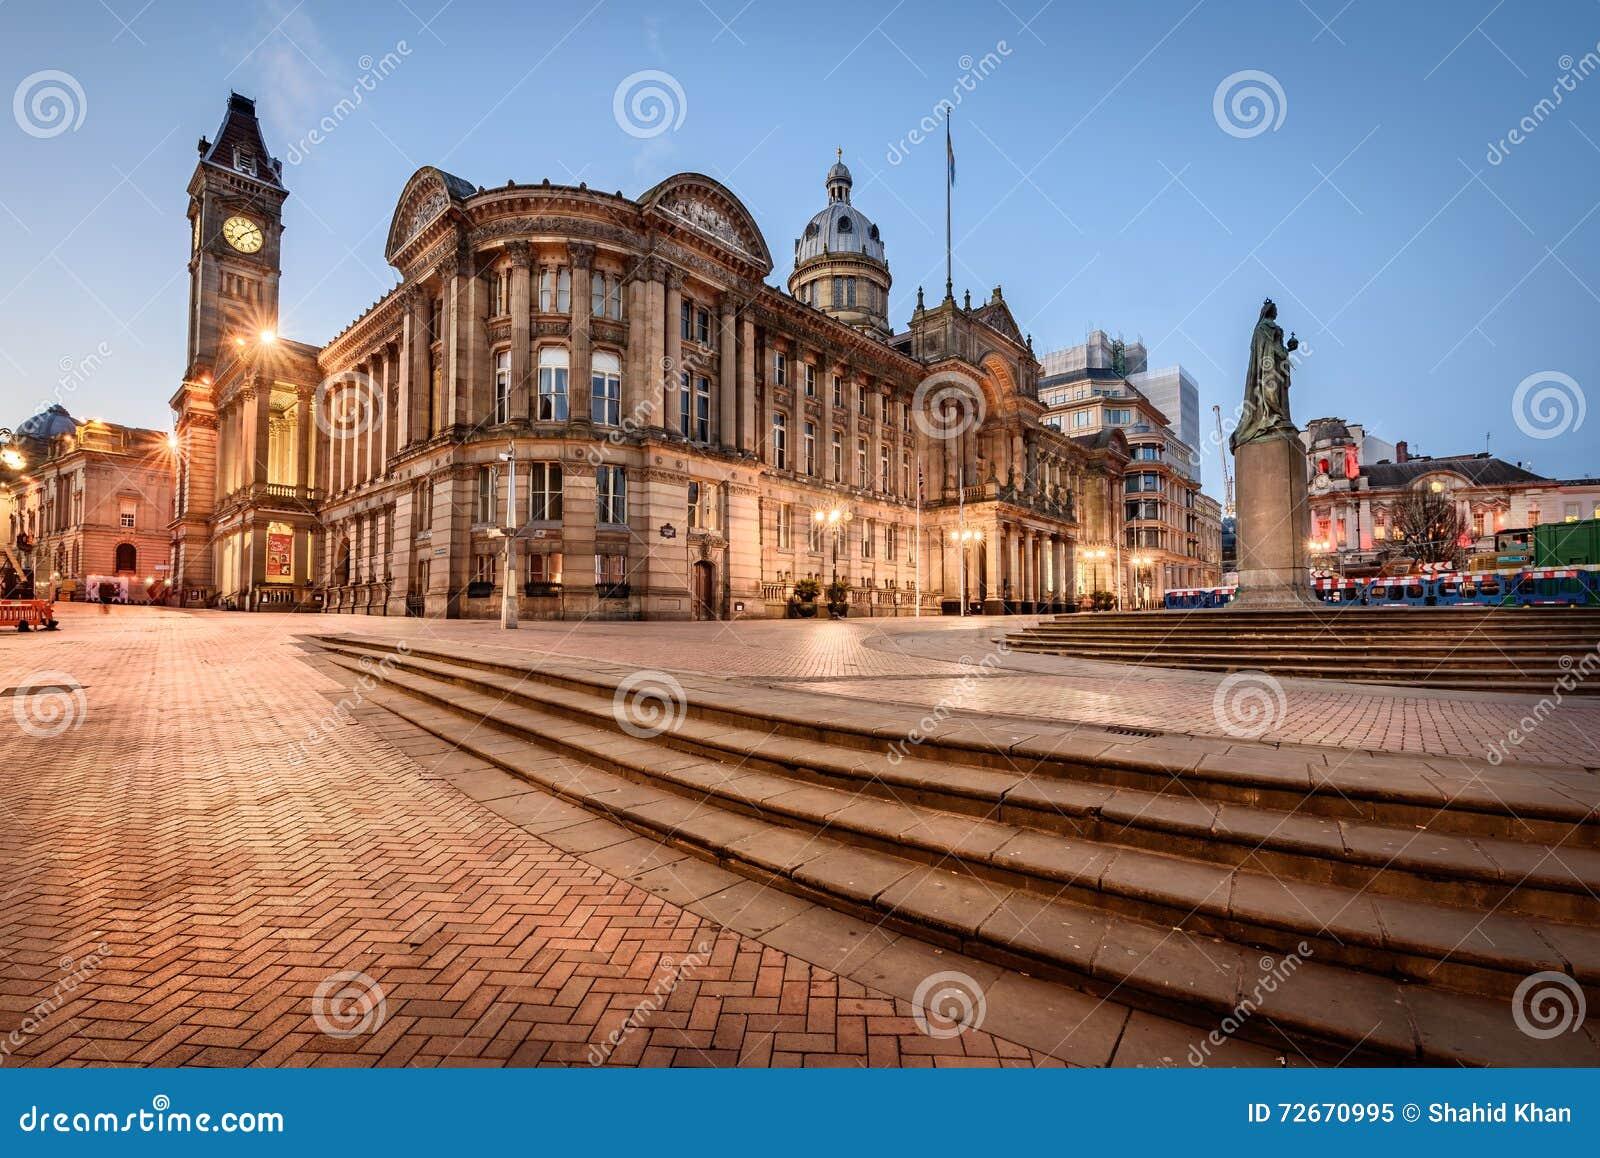 Câmara municipal de Birmingham, Inglaterra